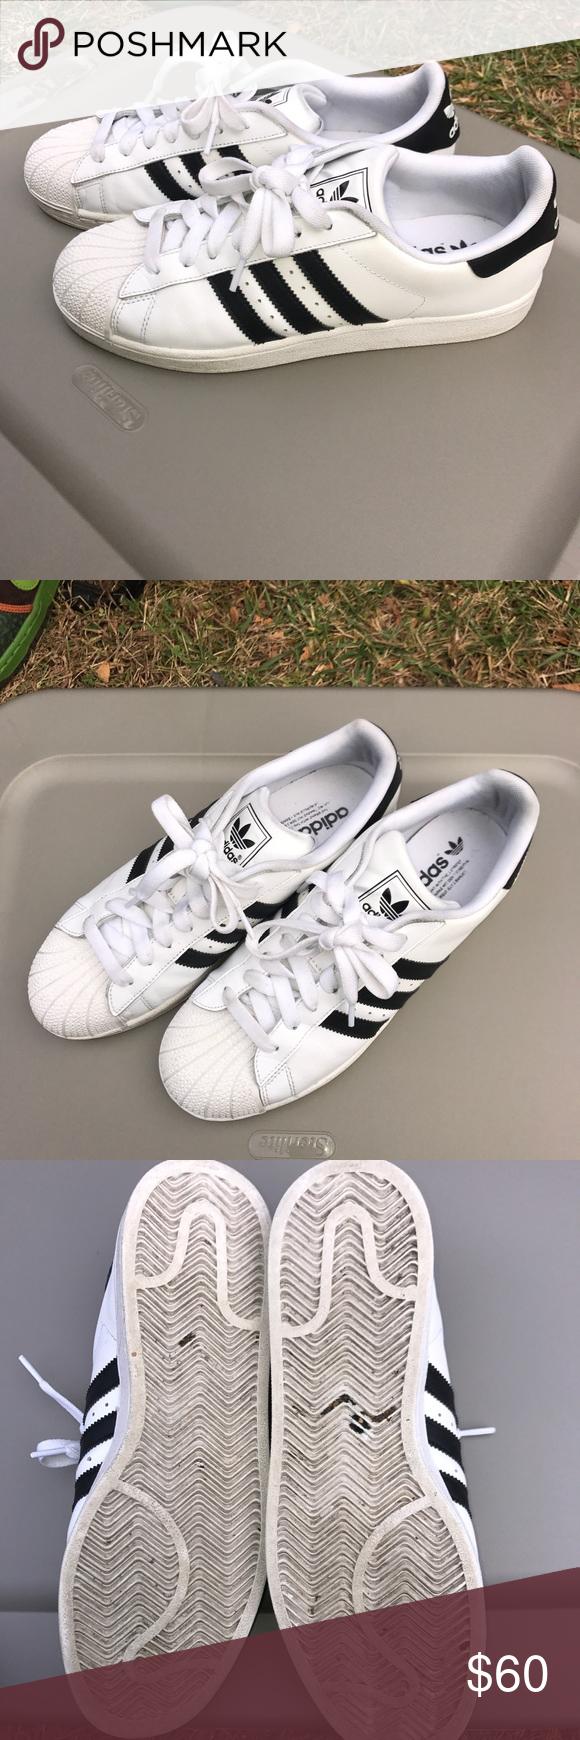 Adidas Superstar Scarpe Taglia Adidas Adidas Superstar, Adidas Taglia E f7adfe